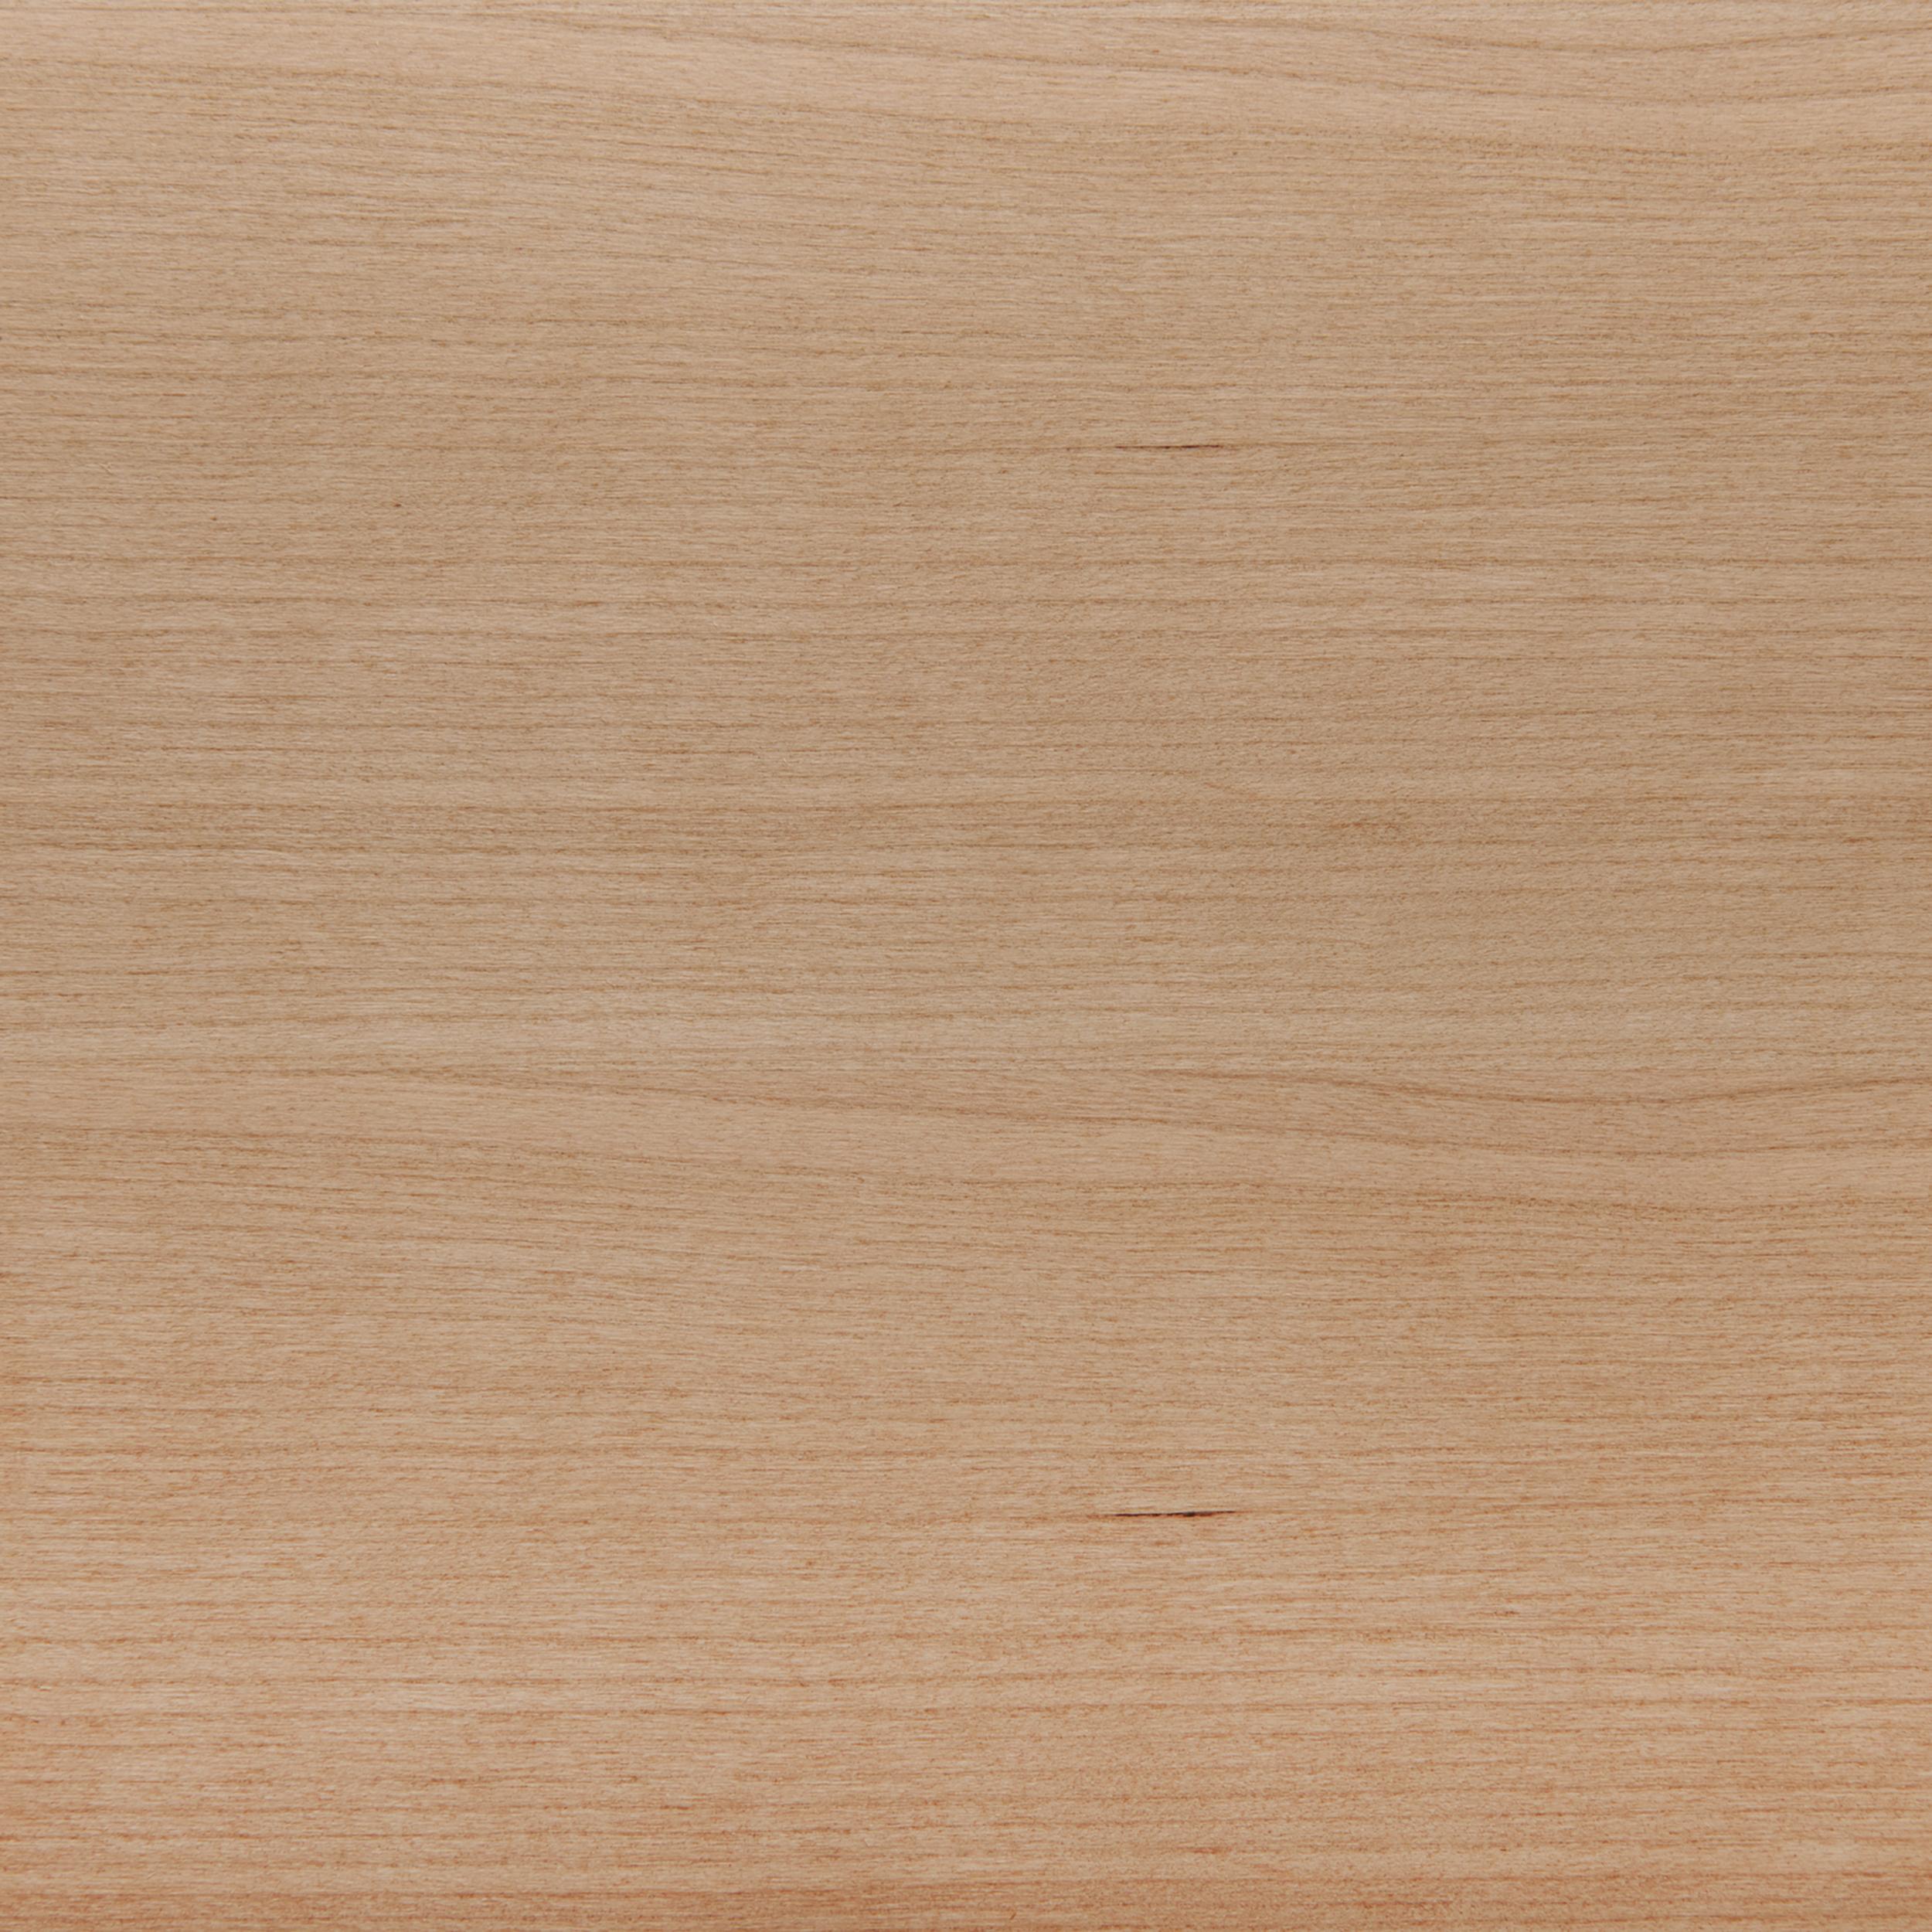 Cherry, Quartersawn 4' x 8' Veneer Sheet, 10MIL Paper Backed